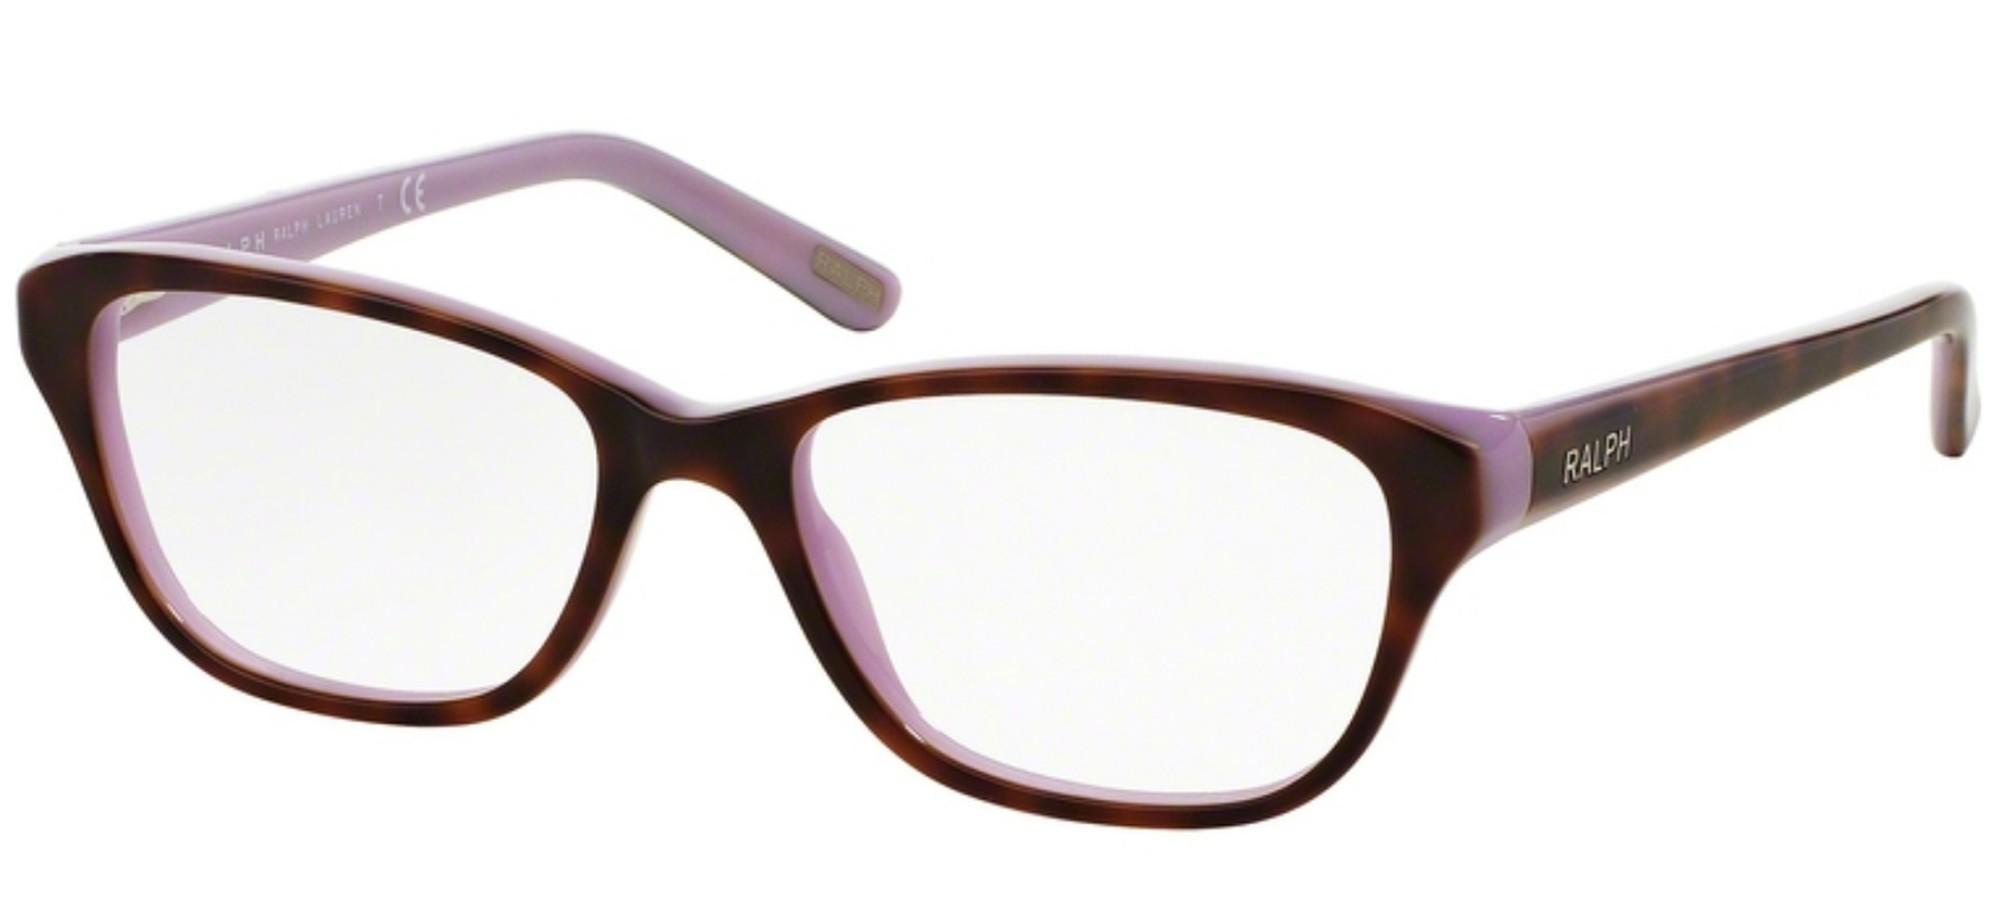 Ralph eyeglasses RA 7020